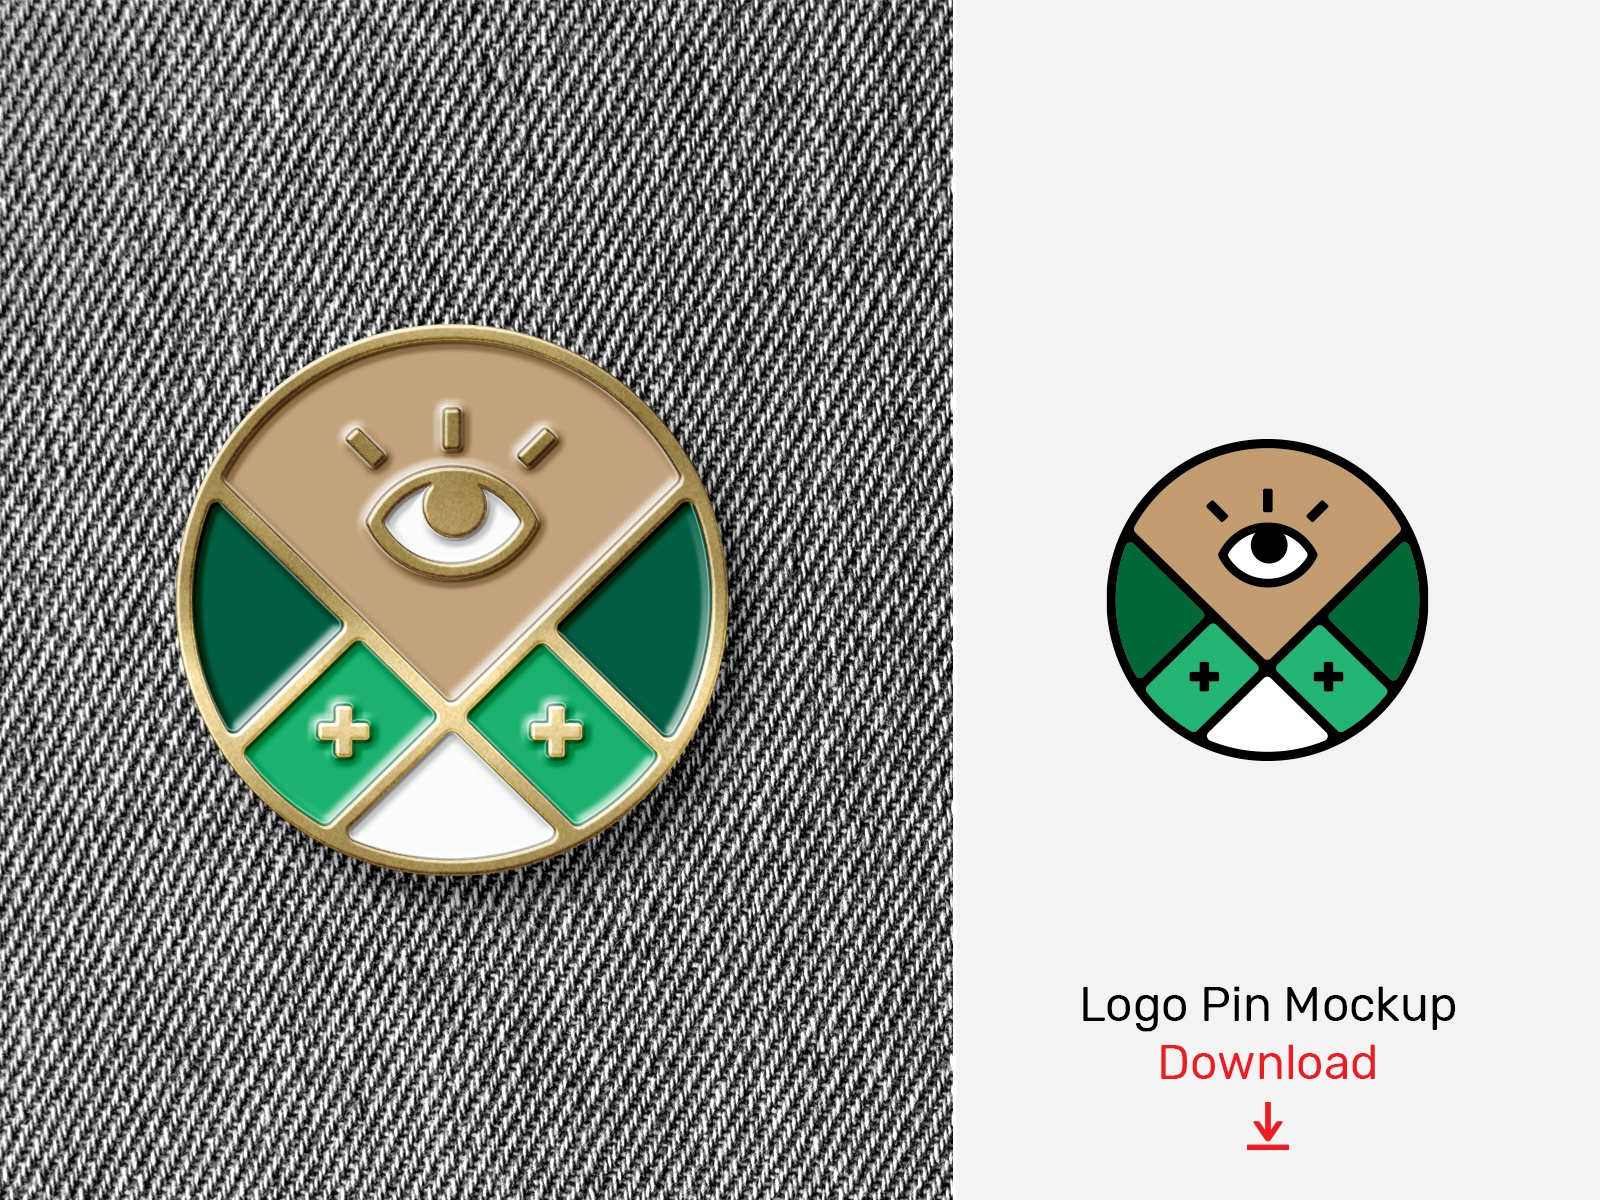 Logo Enamel Pin Mockup by Mr Mockup™   Design Inspiration